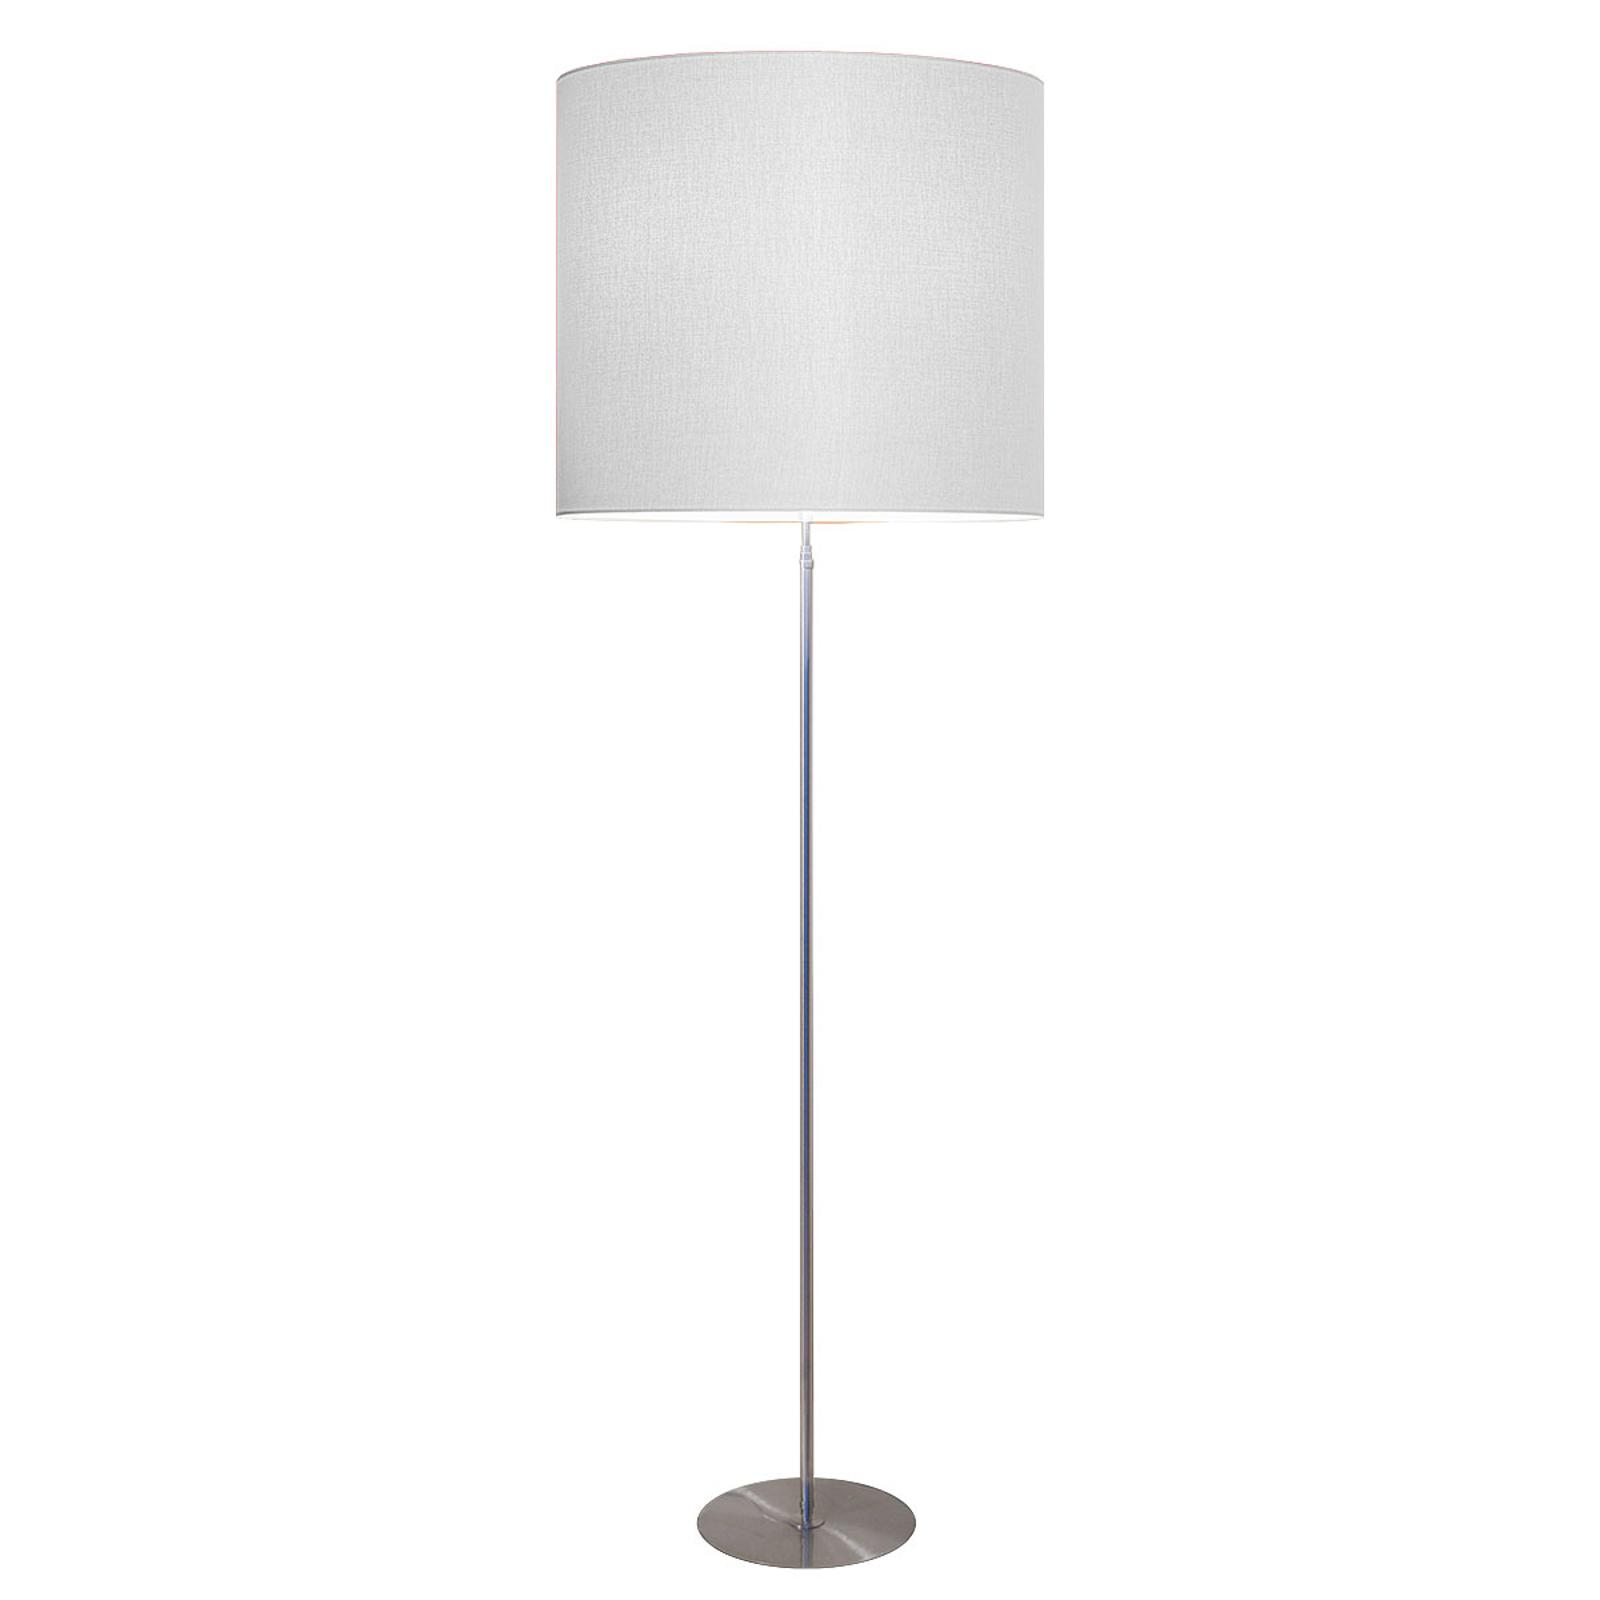 Moderne vloerlamp Tono, wit